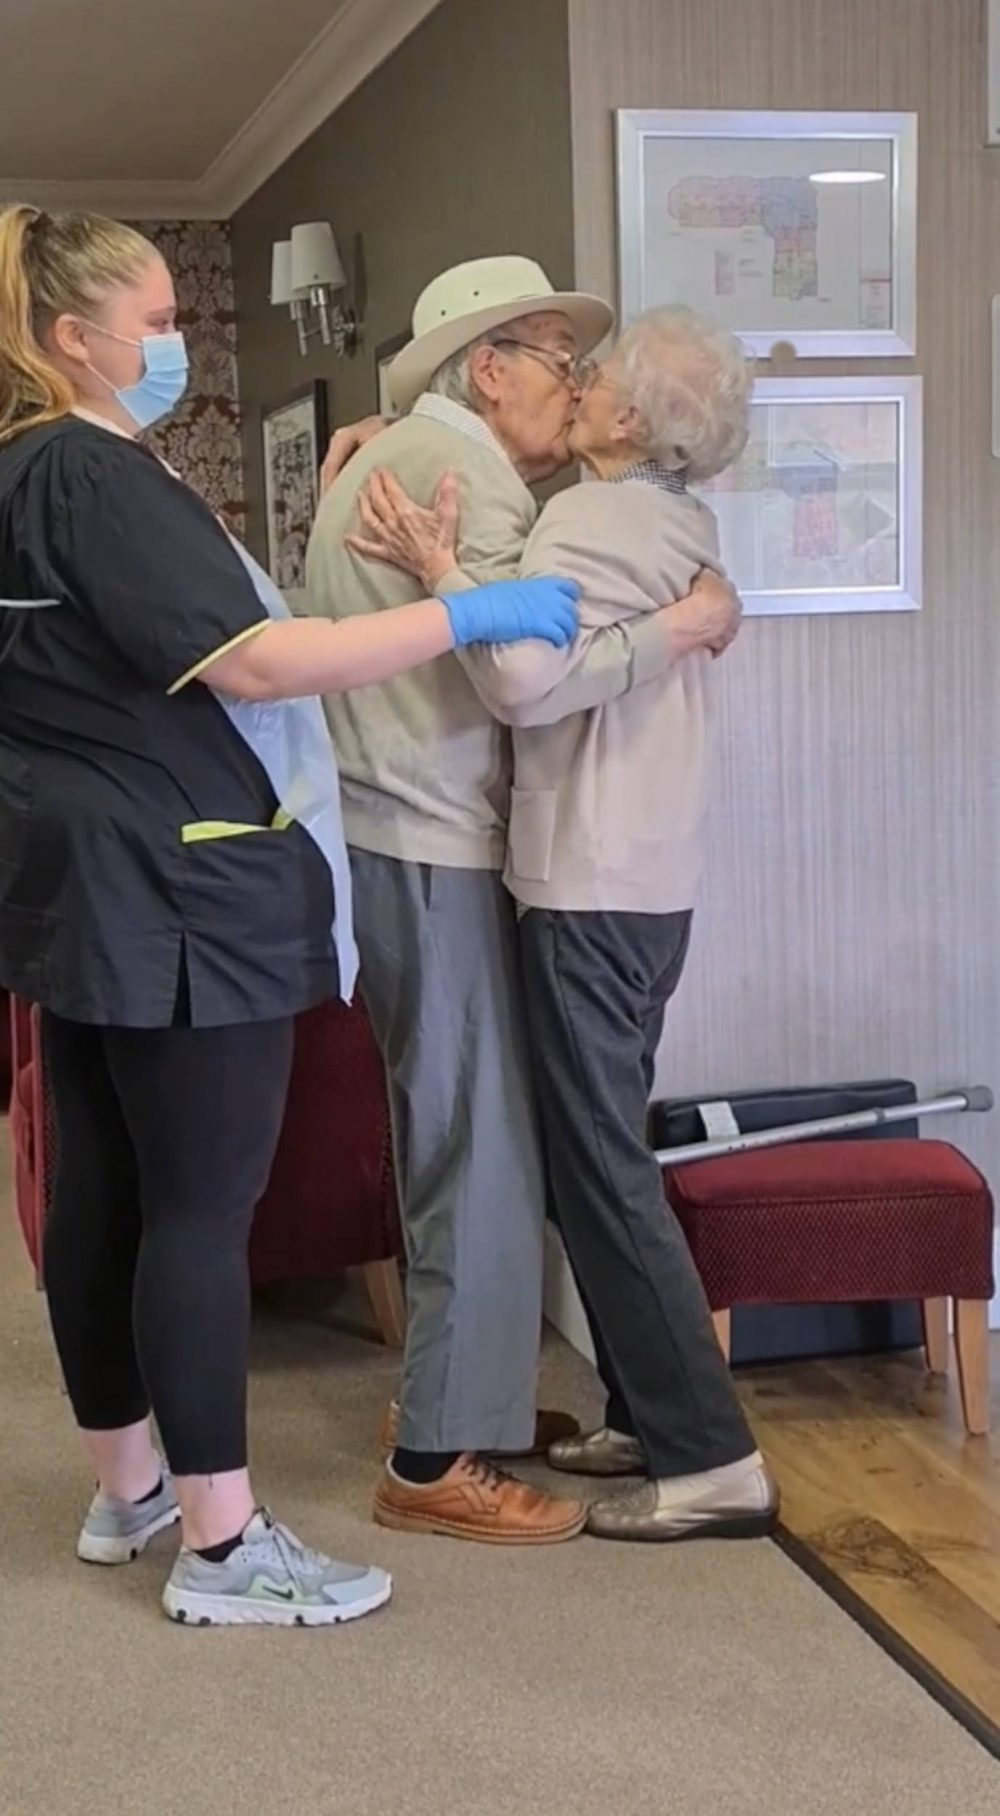 Elderly couple reunited | Viral News UK